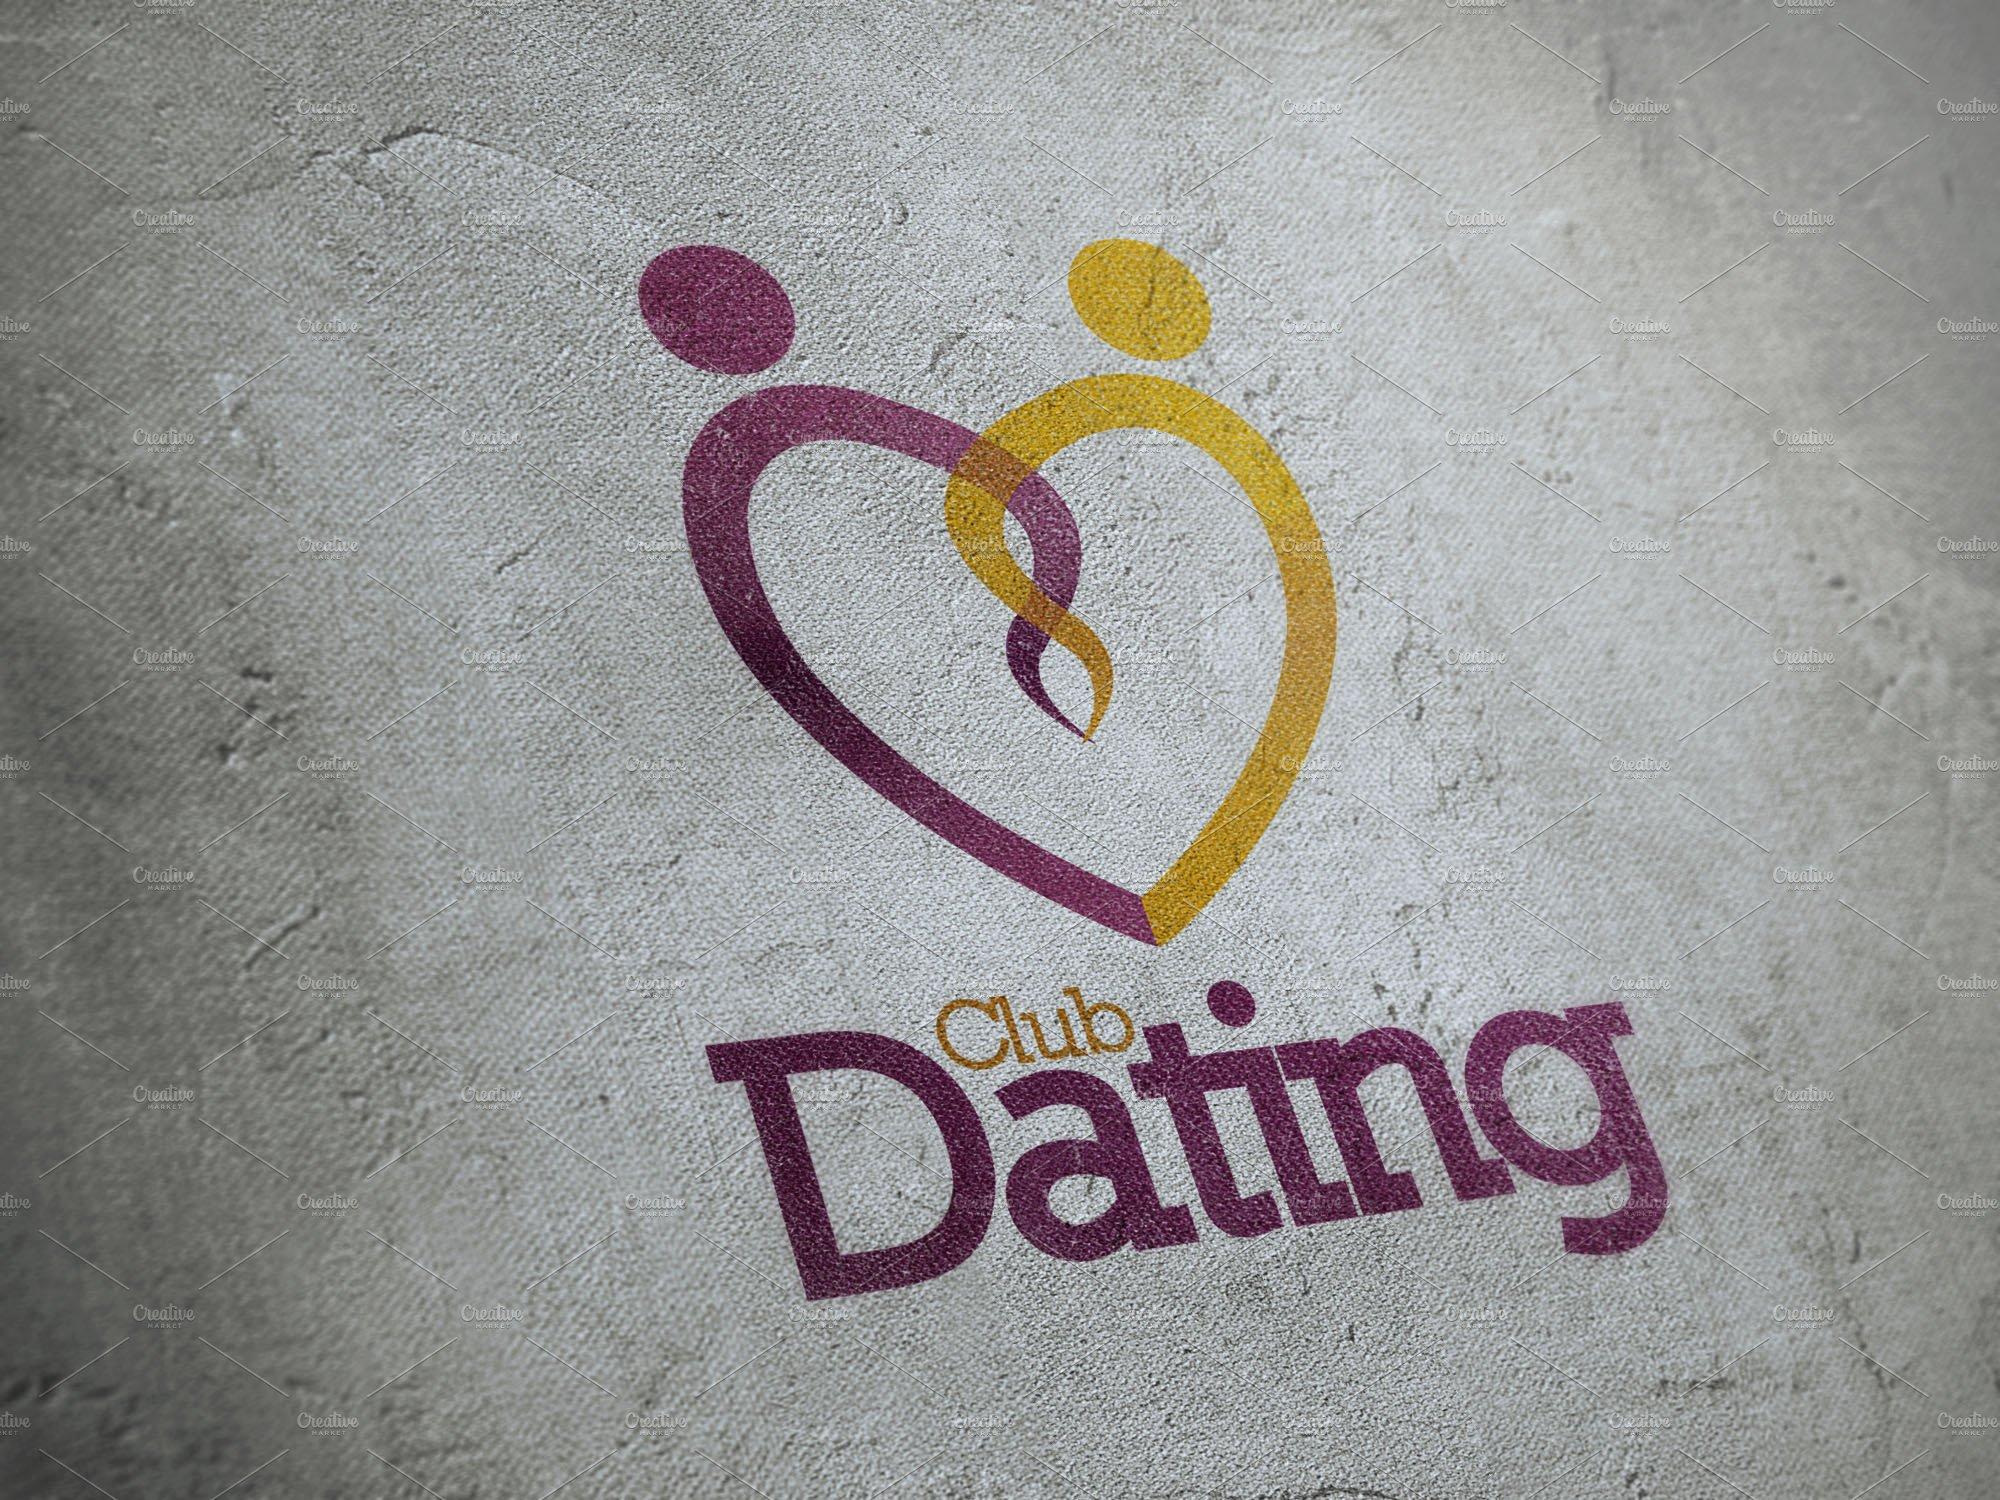 gratis chat utan registrering gratis sex dejting